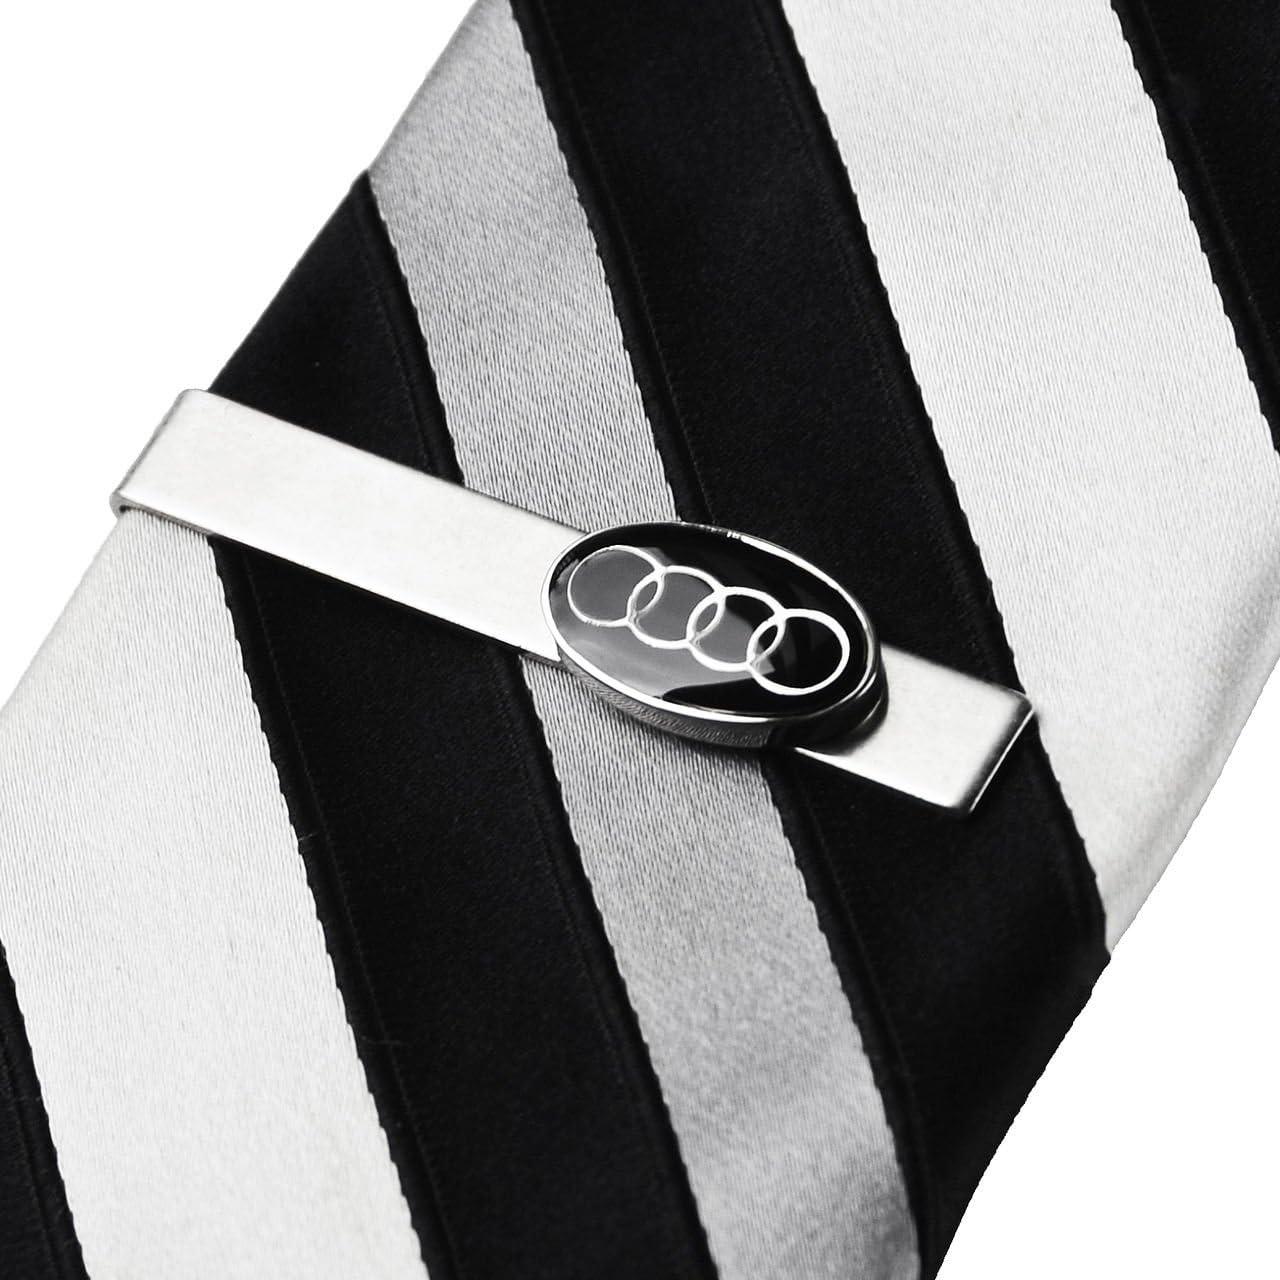 Quality Handcrafts Guaranteed Audi Tie Clip